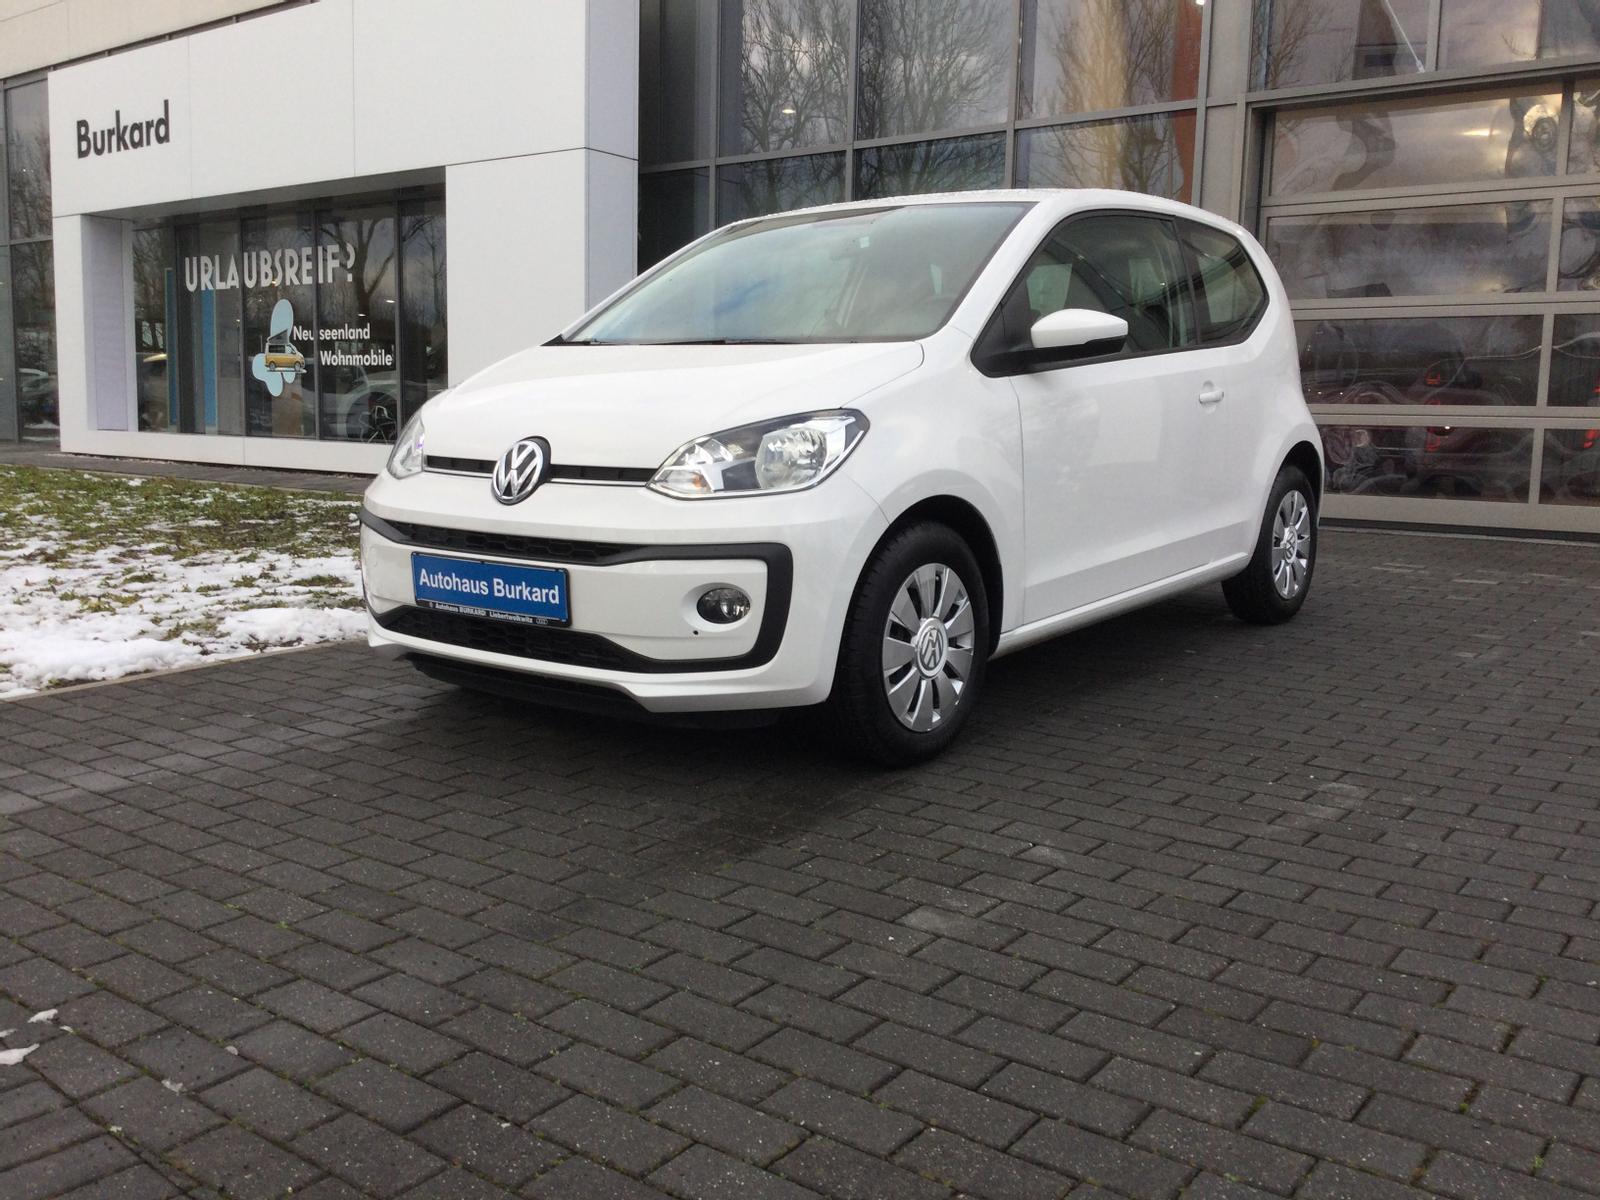 Volkswagen Move up! 1,0 l 60 PS | Klima, Jahr 2019, Benzin